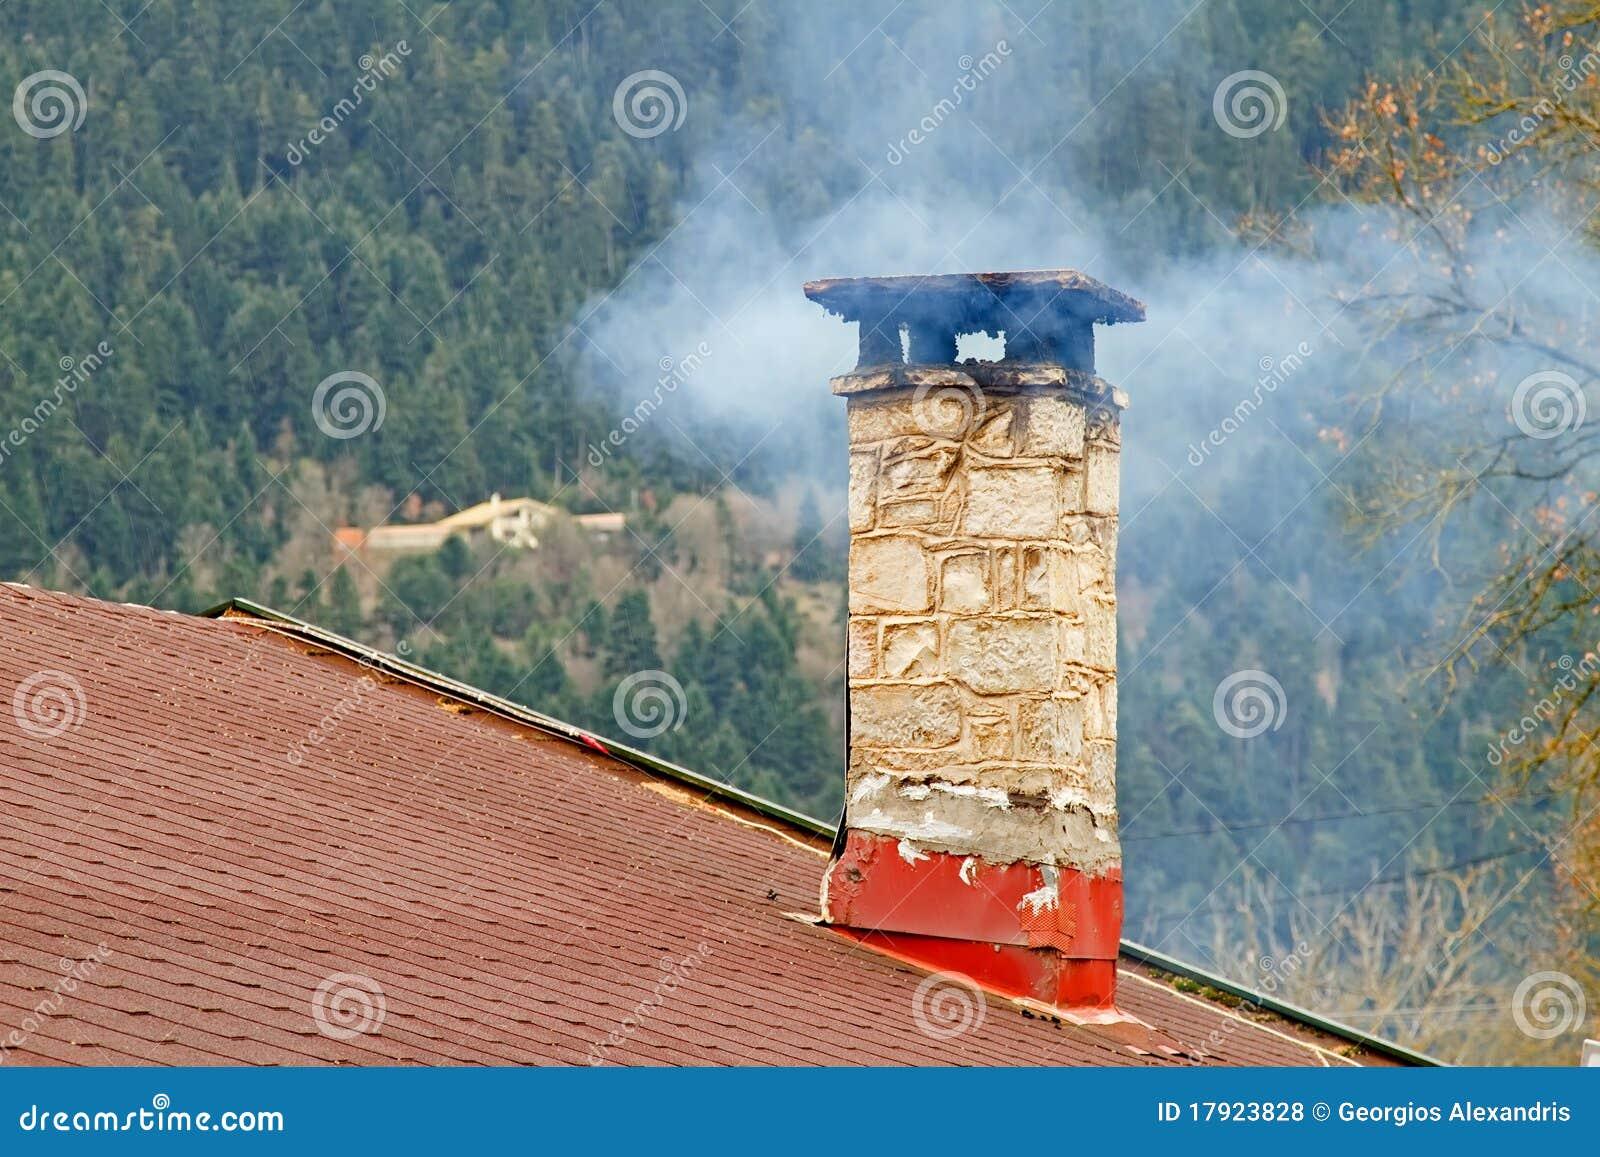 Chimenea y humo foto de archivo imagen de smoking griego - La casa de la chimenea ...